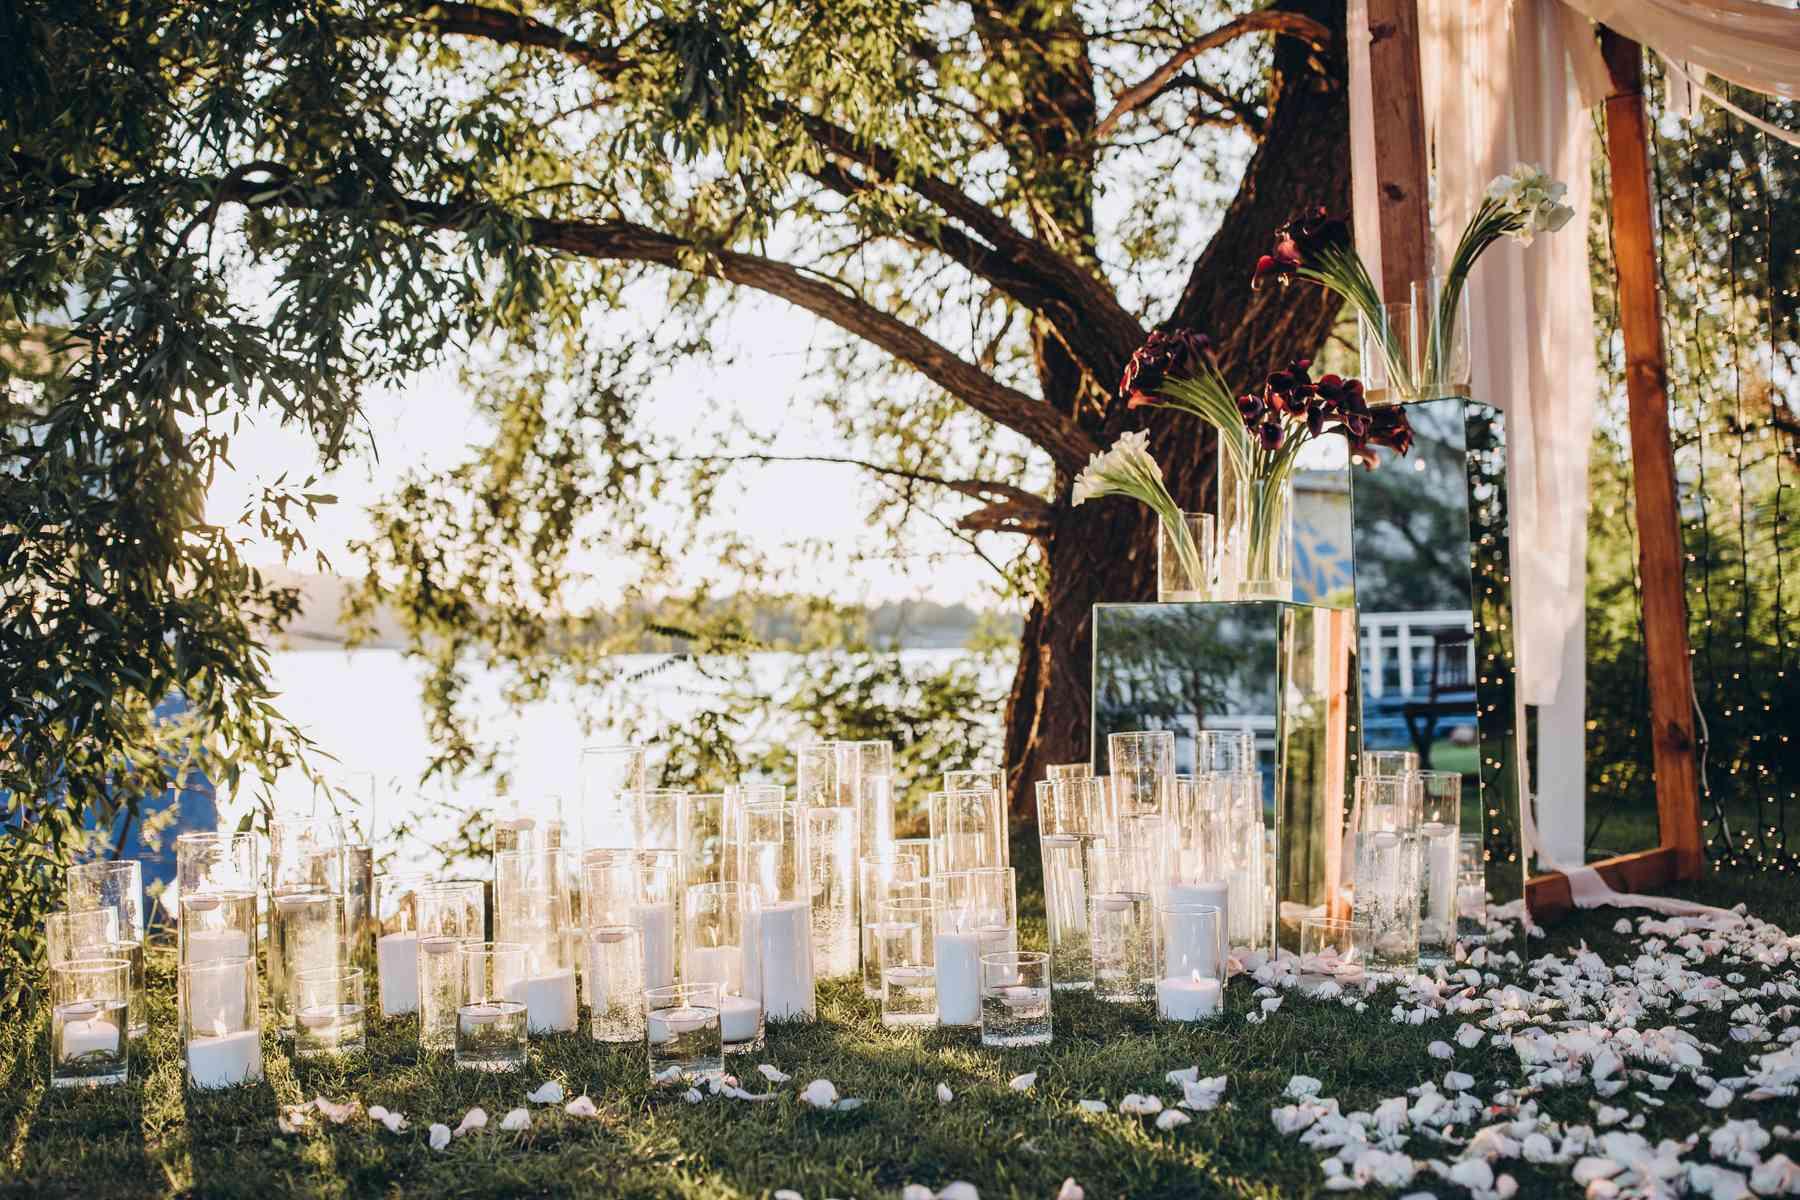 много колб со свечами на церемонии